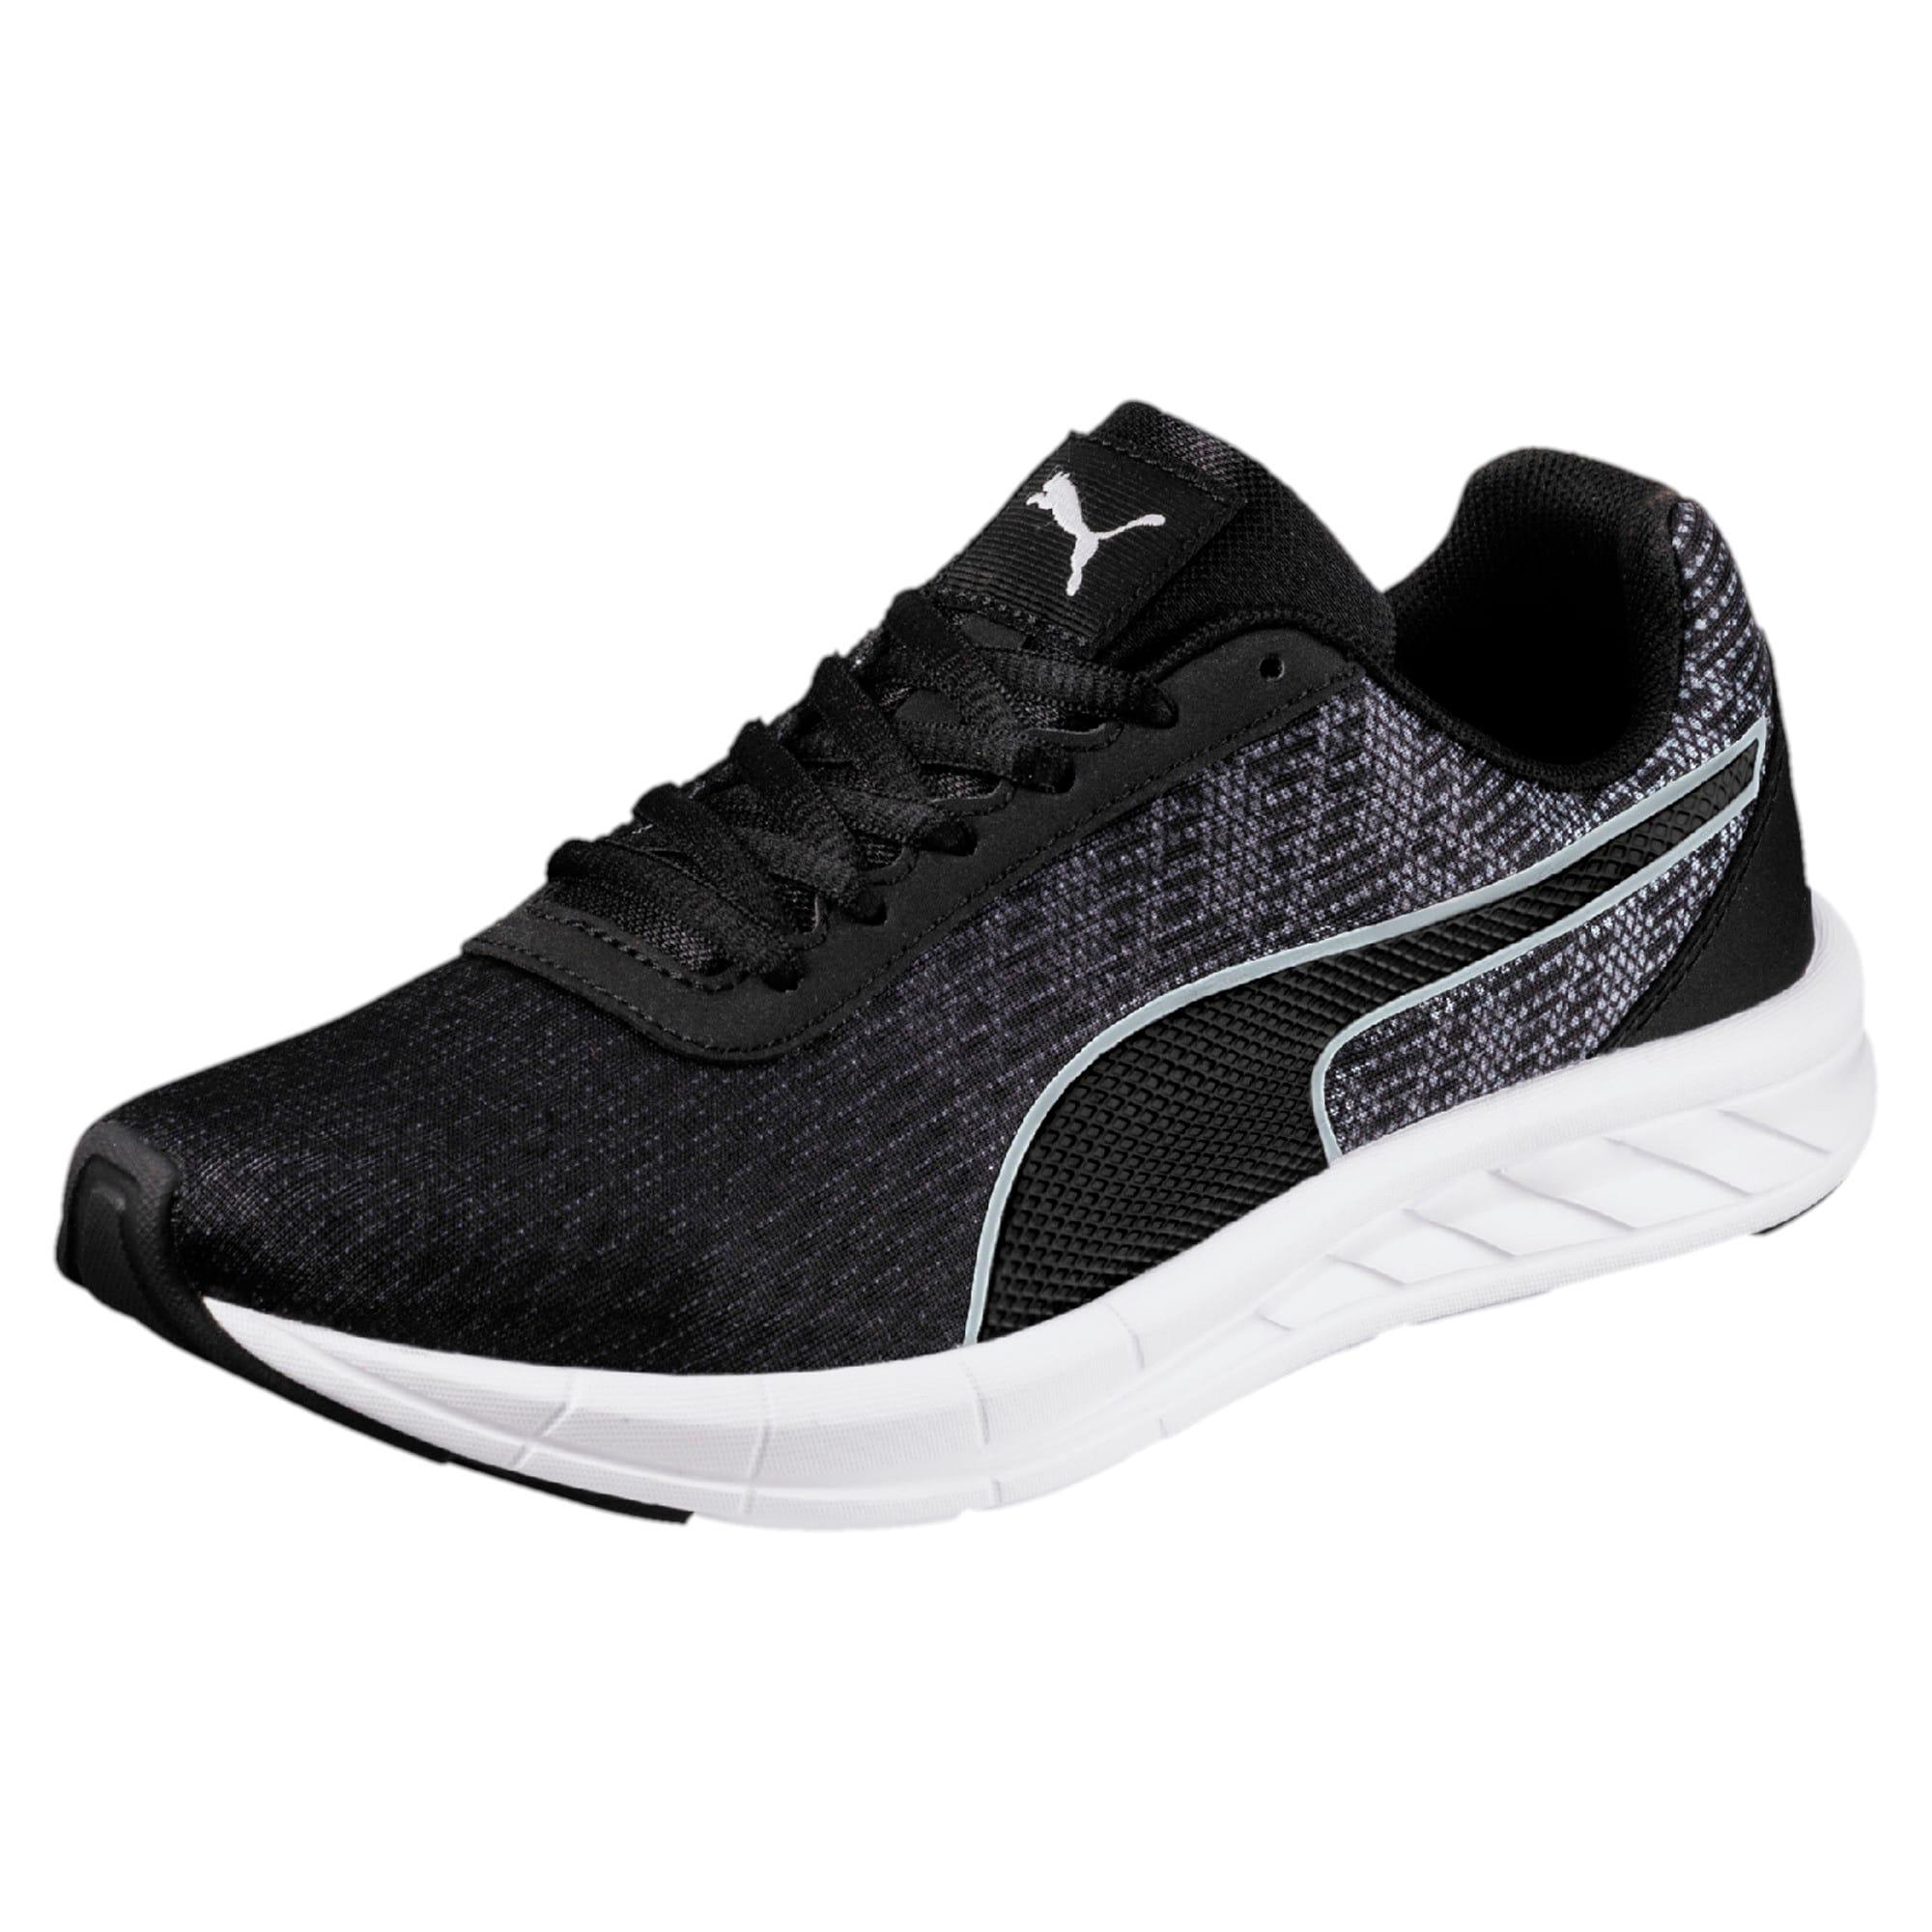 Thumbnail 1 of Comet Kids' Running Shoes, Quarry-Puma Black, medium-IND